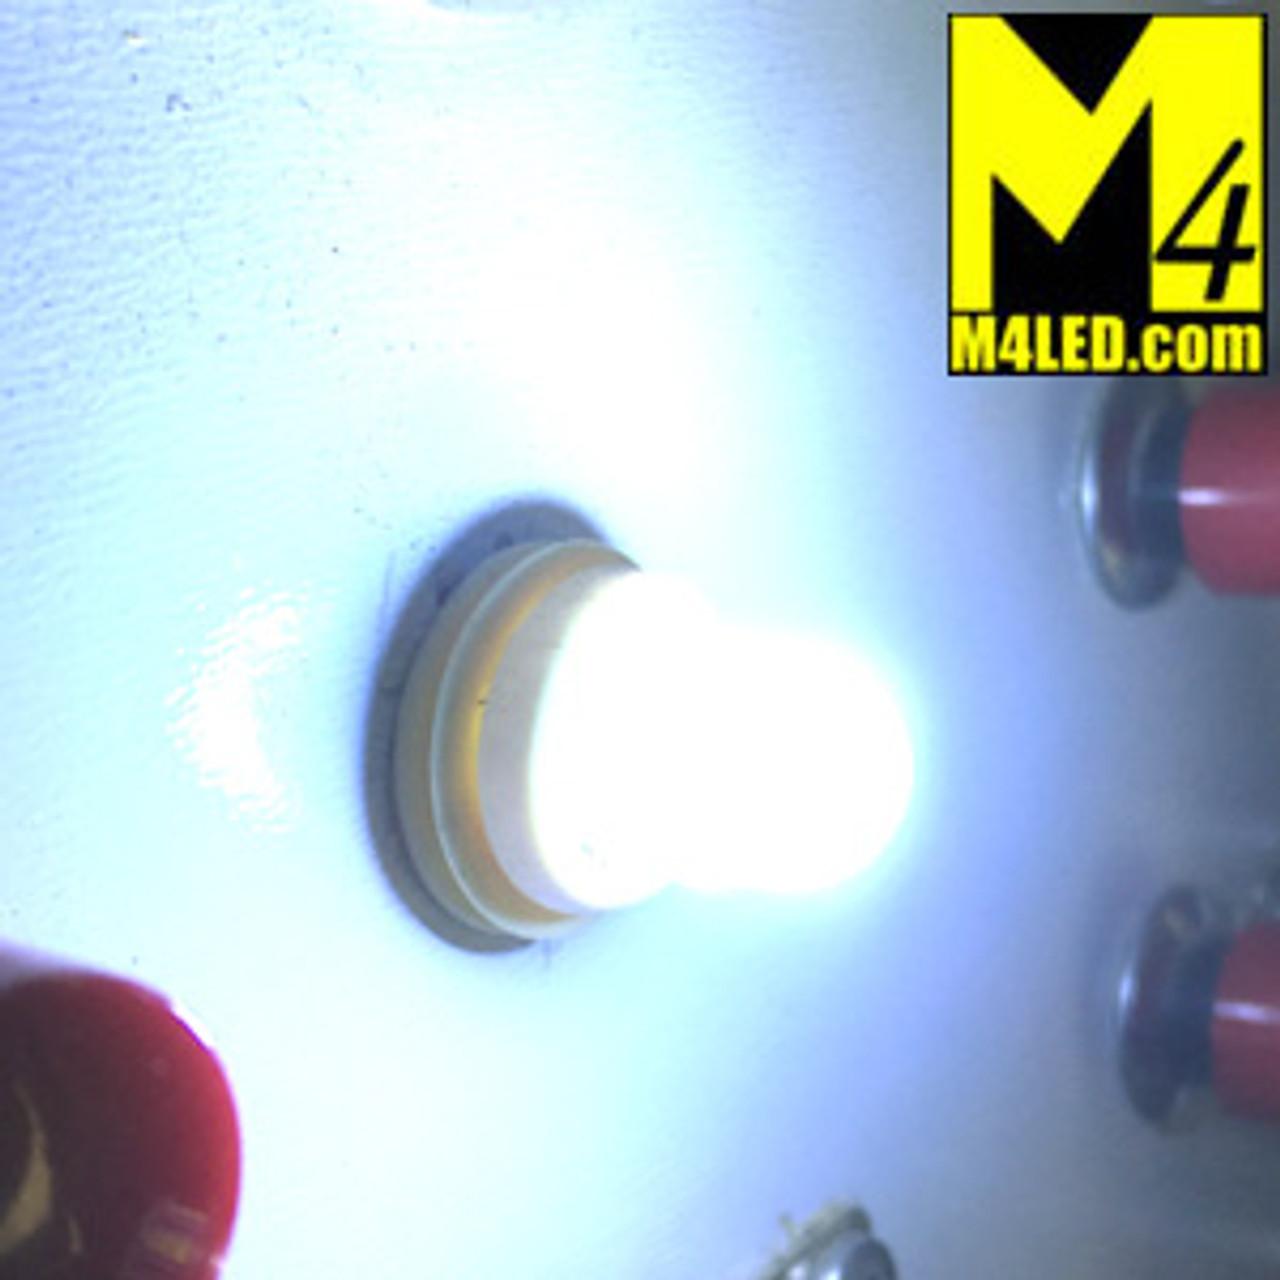 BA9s-3D-2-CW Cool White LED Light Bulb with Mini Round Base